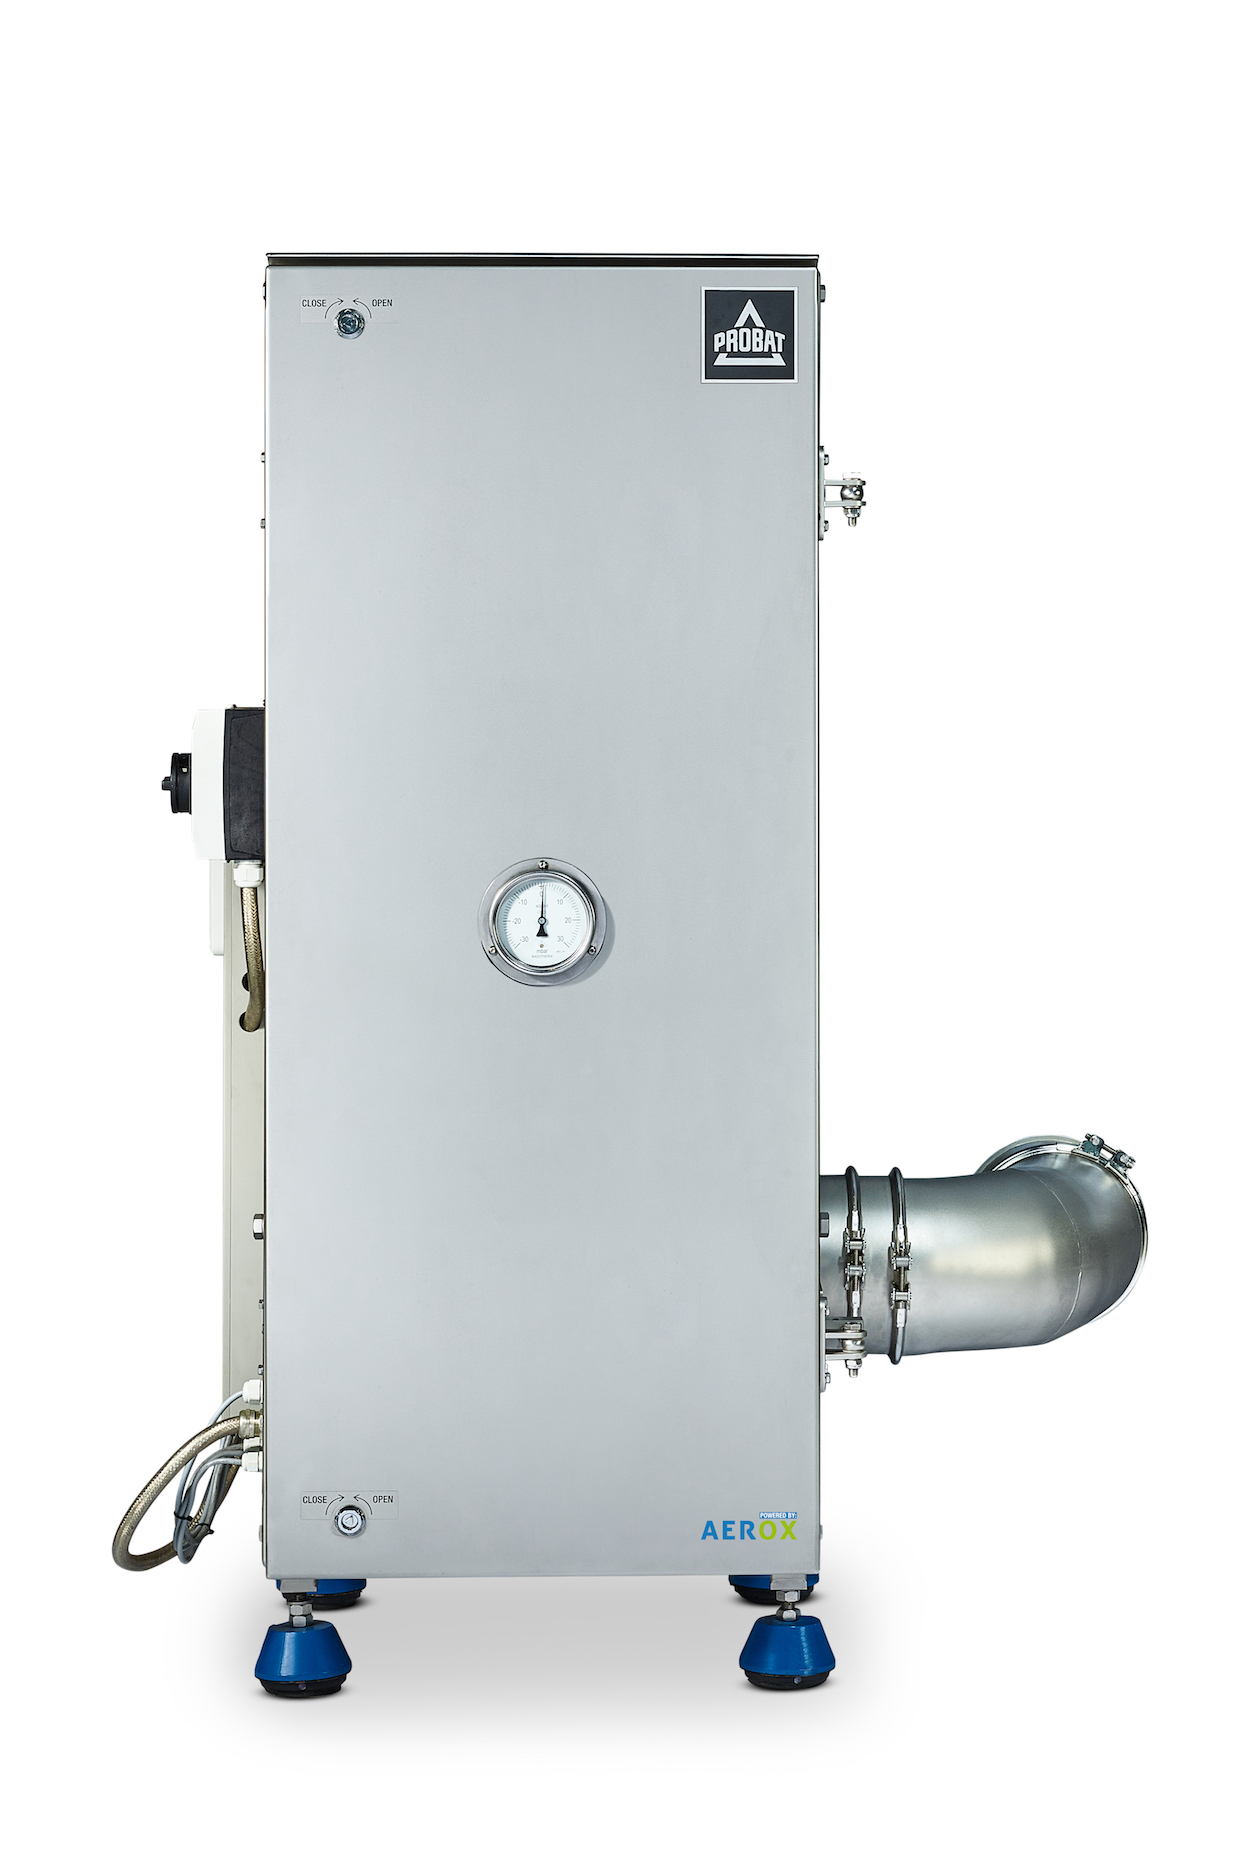 Proair cold plasma injector